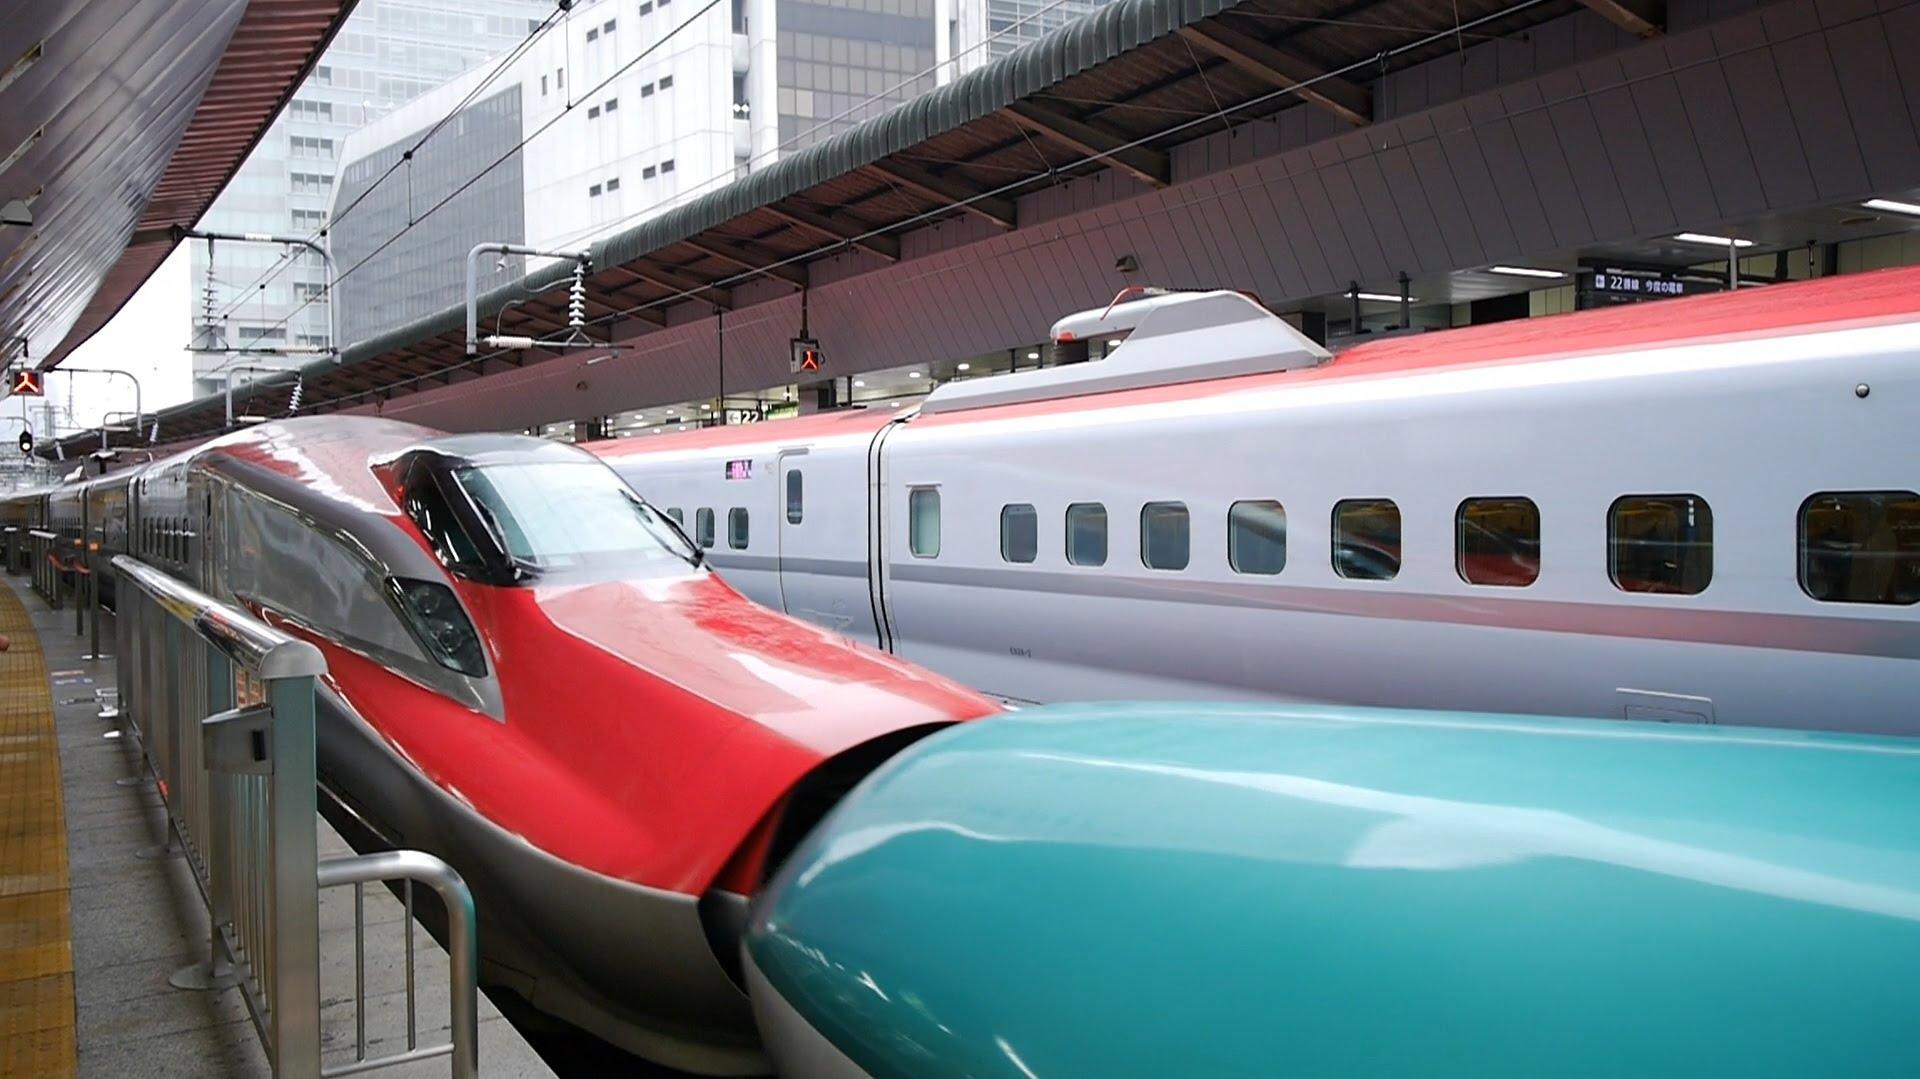 【60fps】秋田新幹線 こまち65号 超広角車窓 大曲まで進行左側 東京・上野~盛岡~秋田